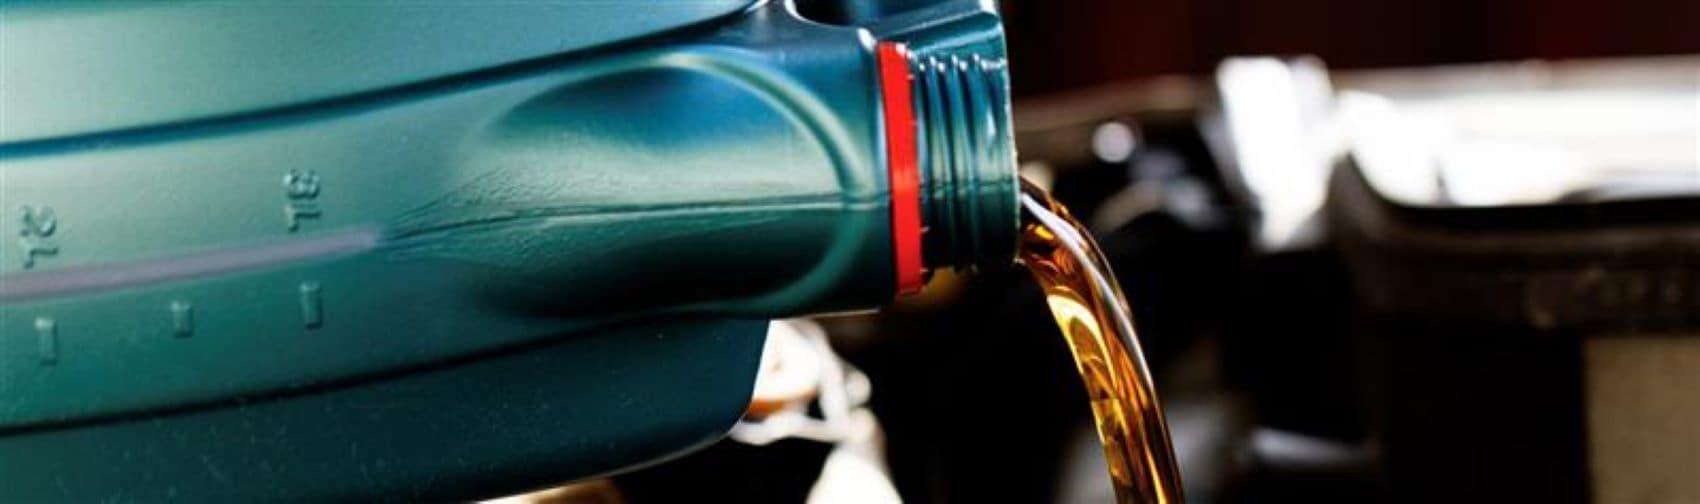 Oil Change Hilliard OH